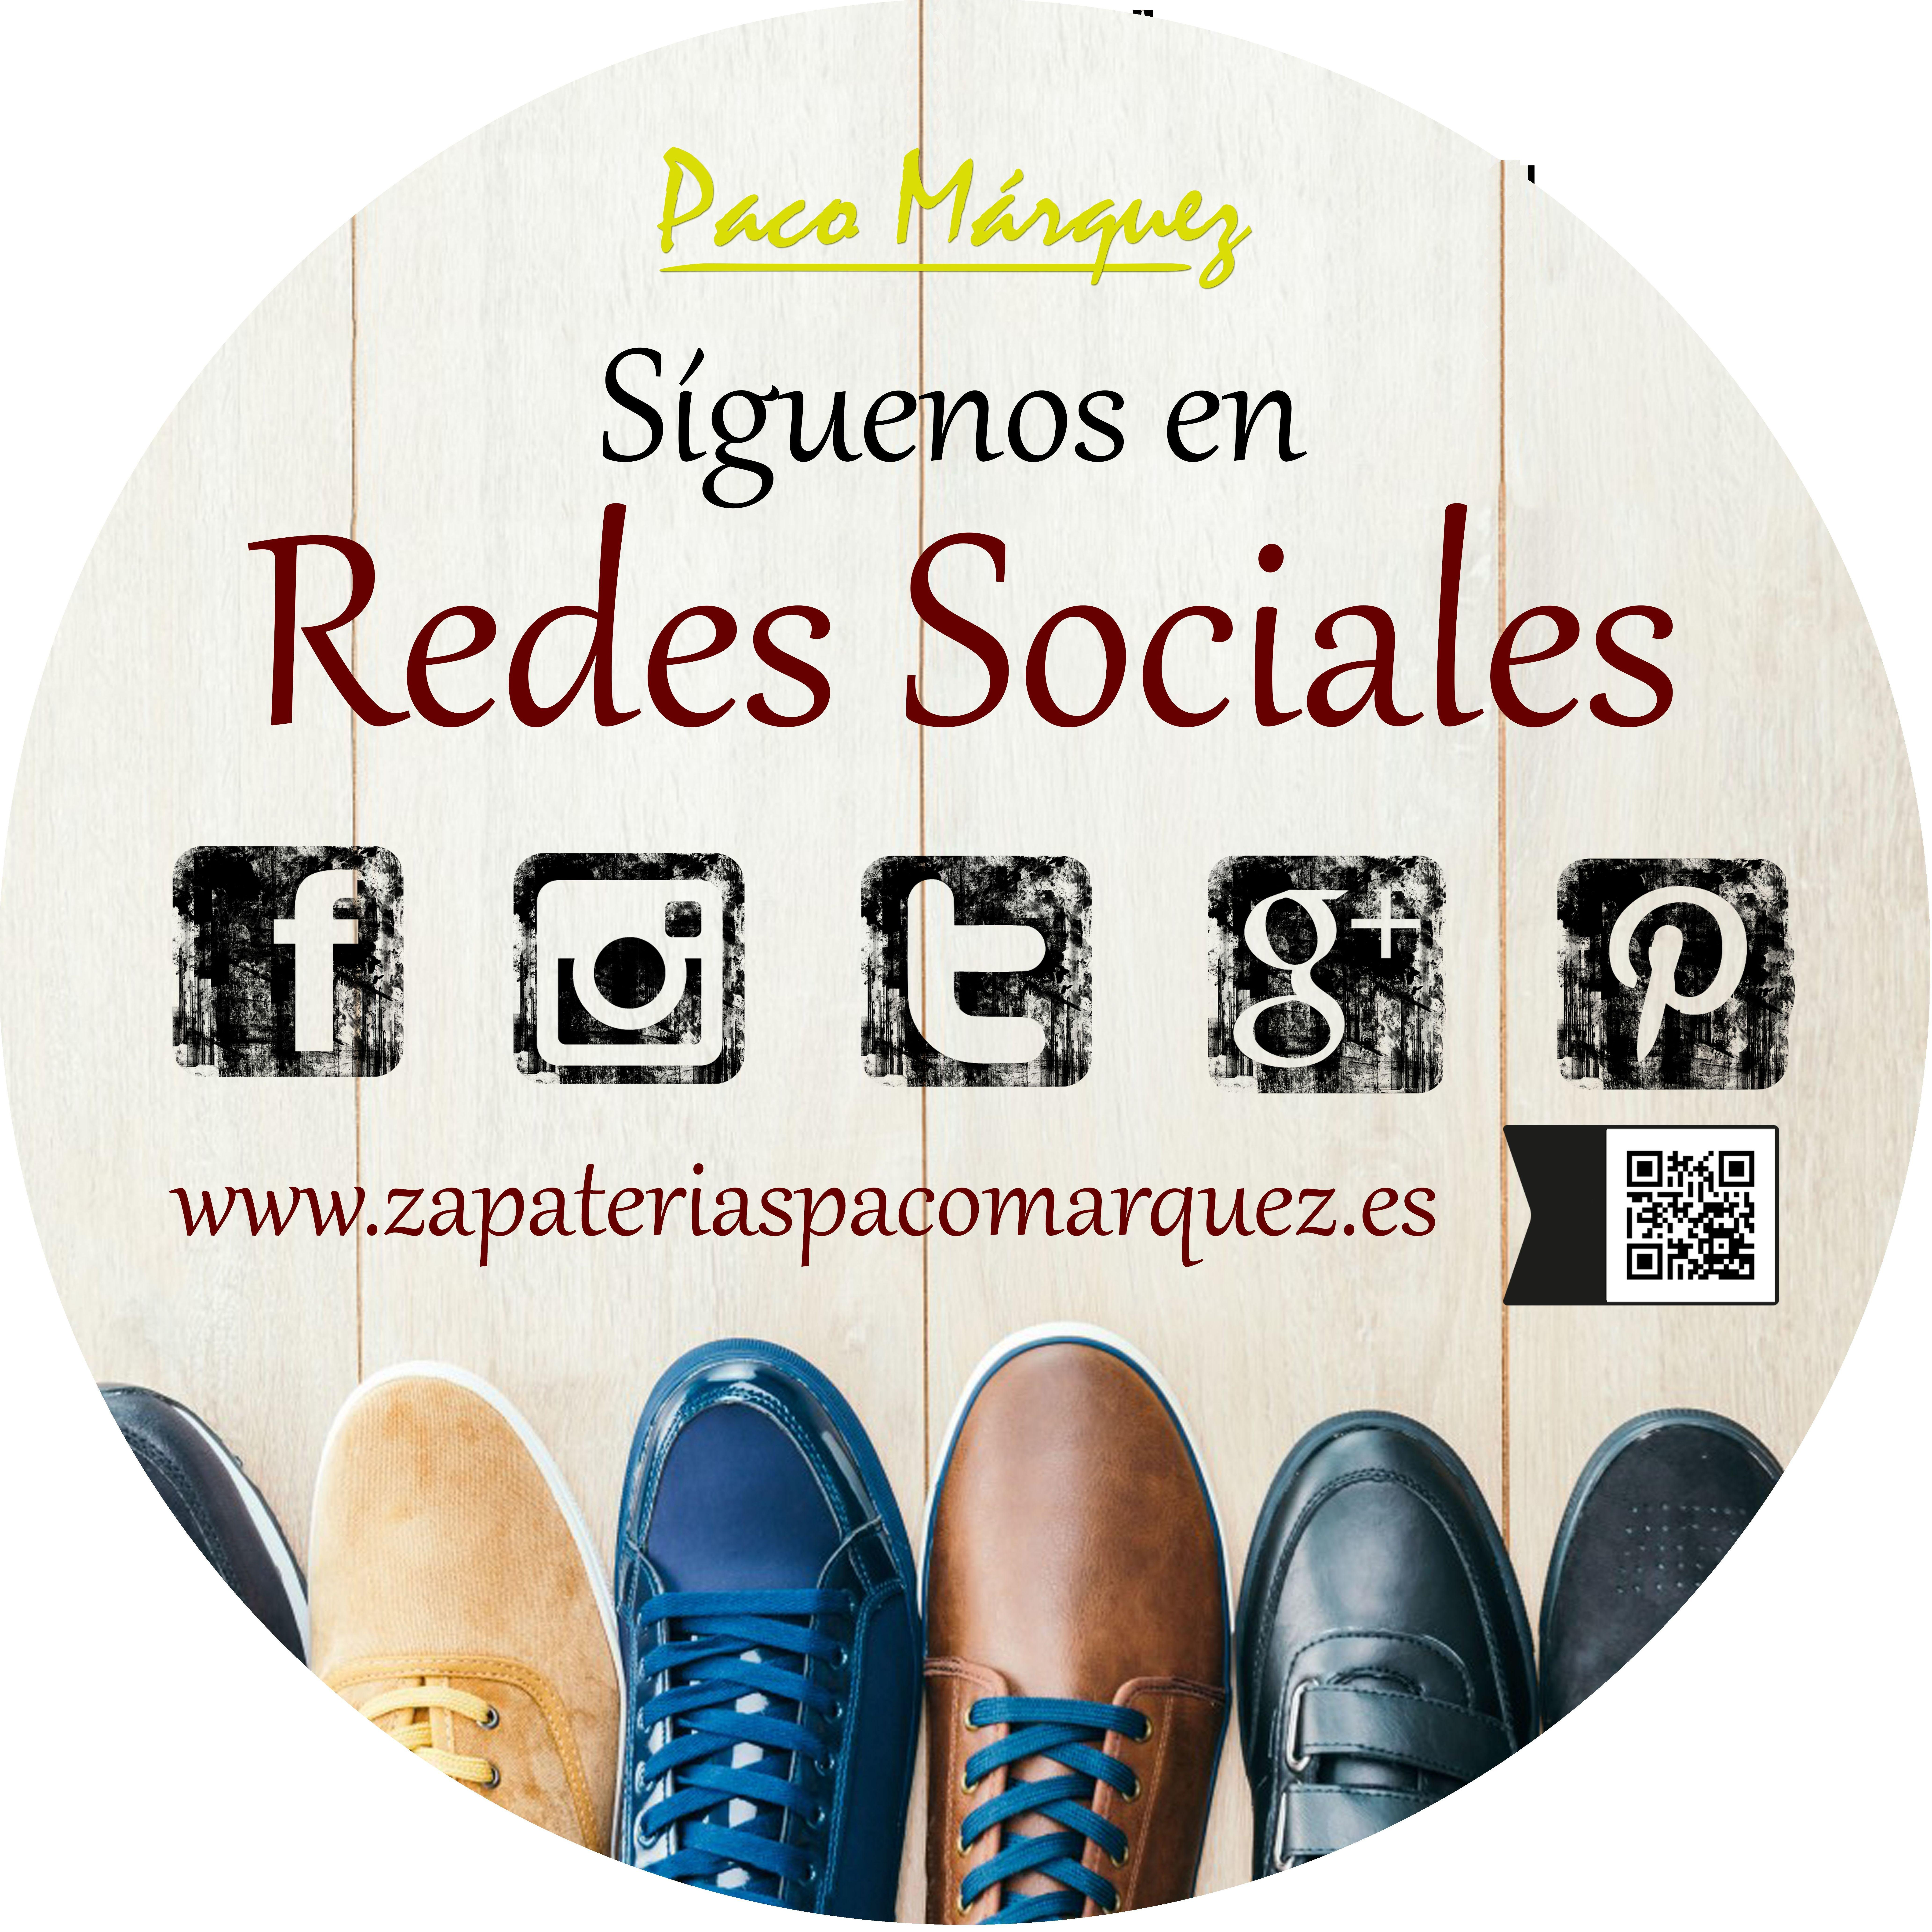 Redes Sociales Calzados Márquez